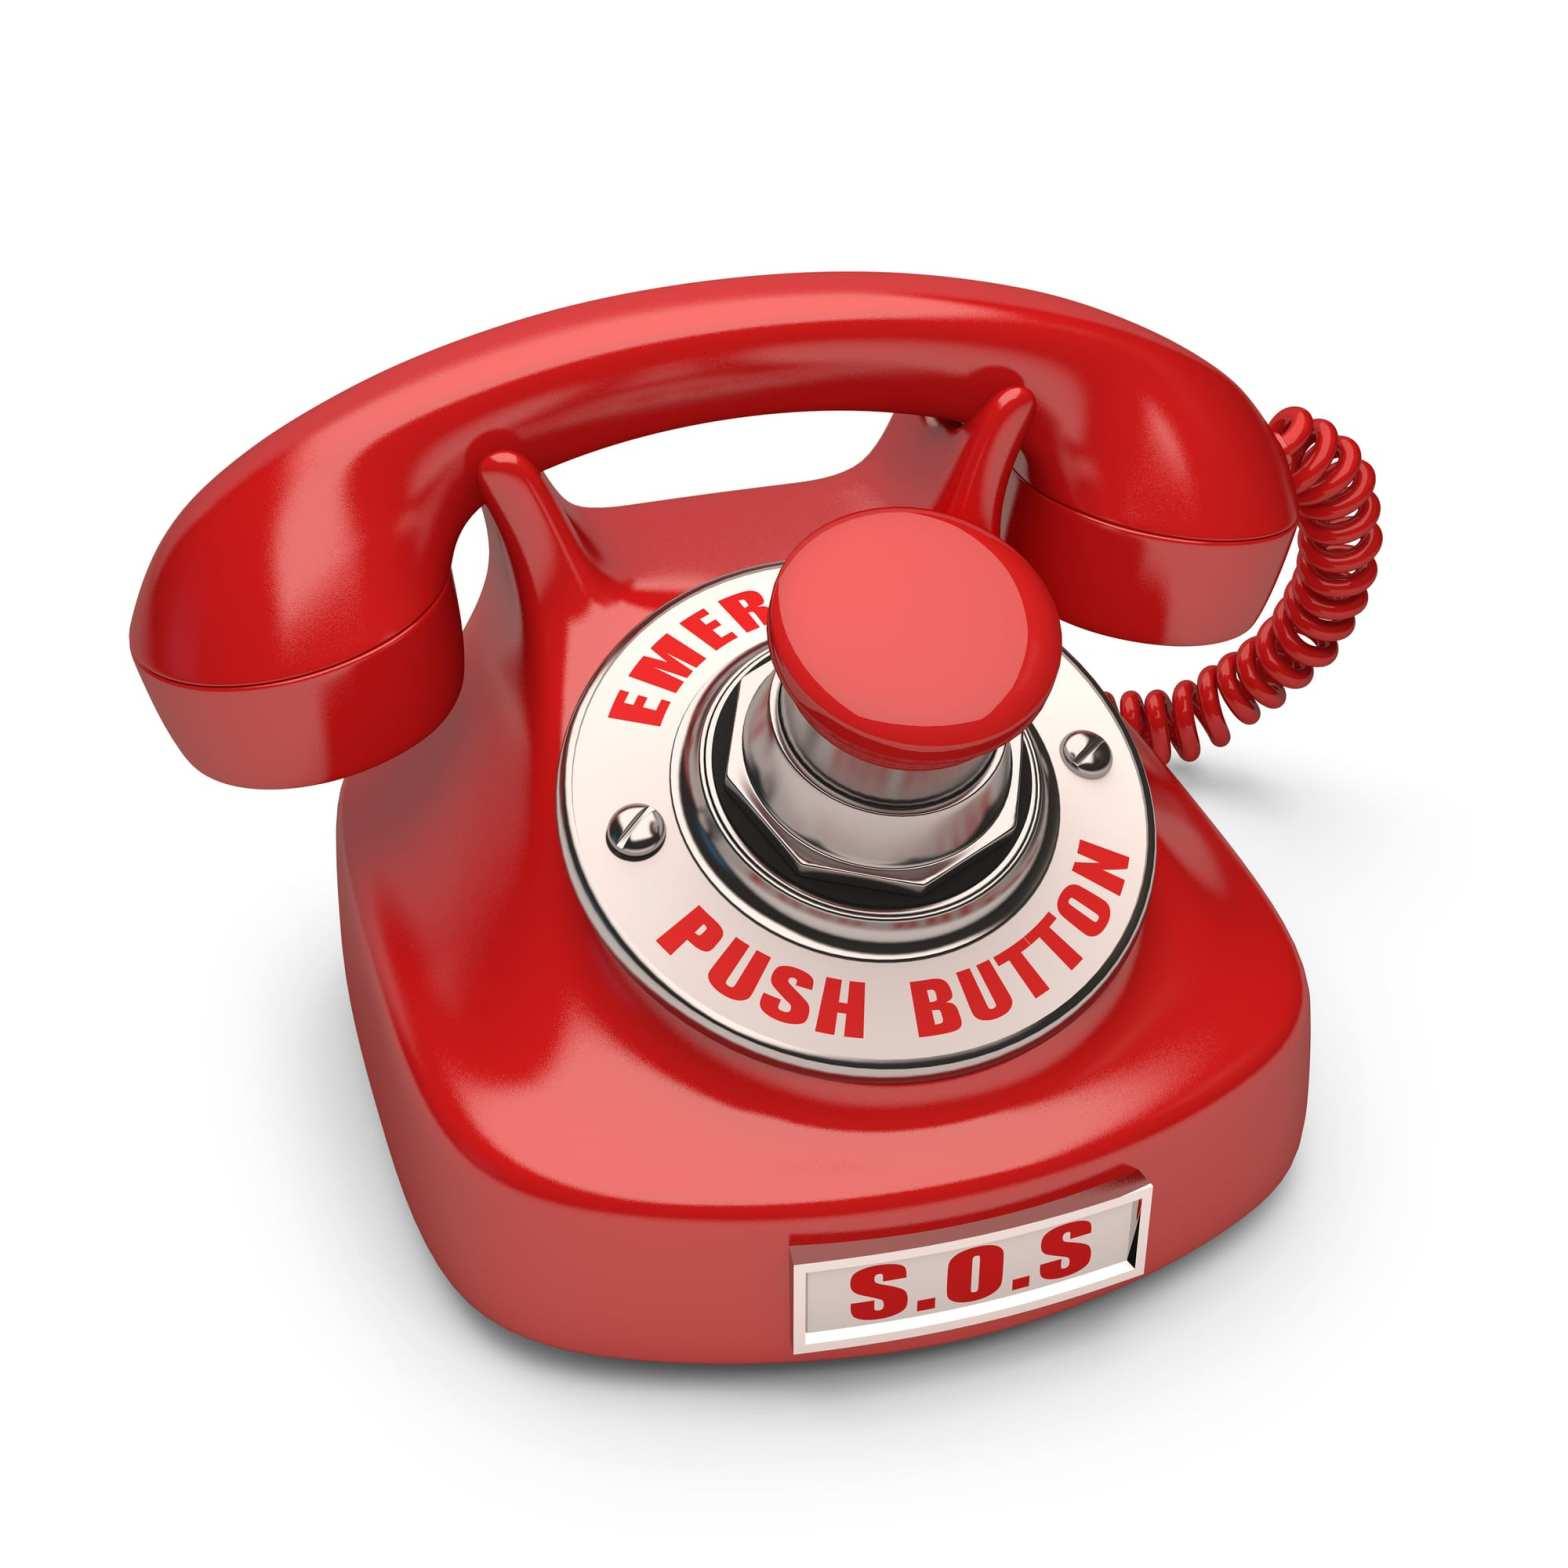 property emergency phone